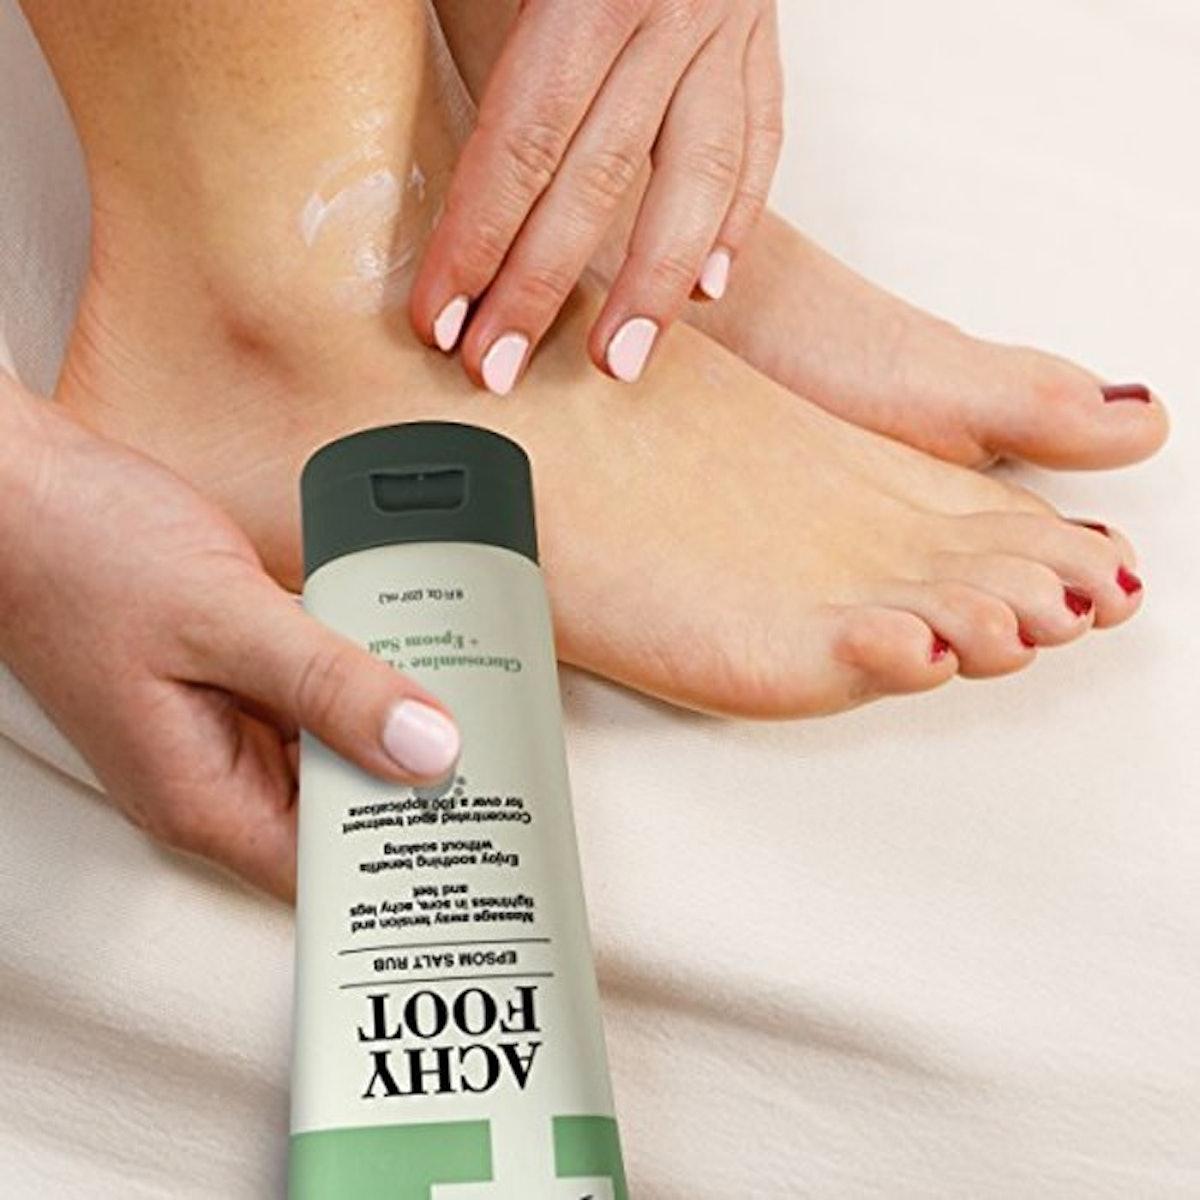 Dr. Foot Achy Foot Epsom Salt Rub